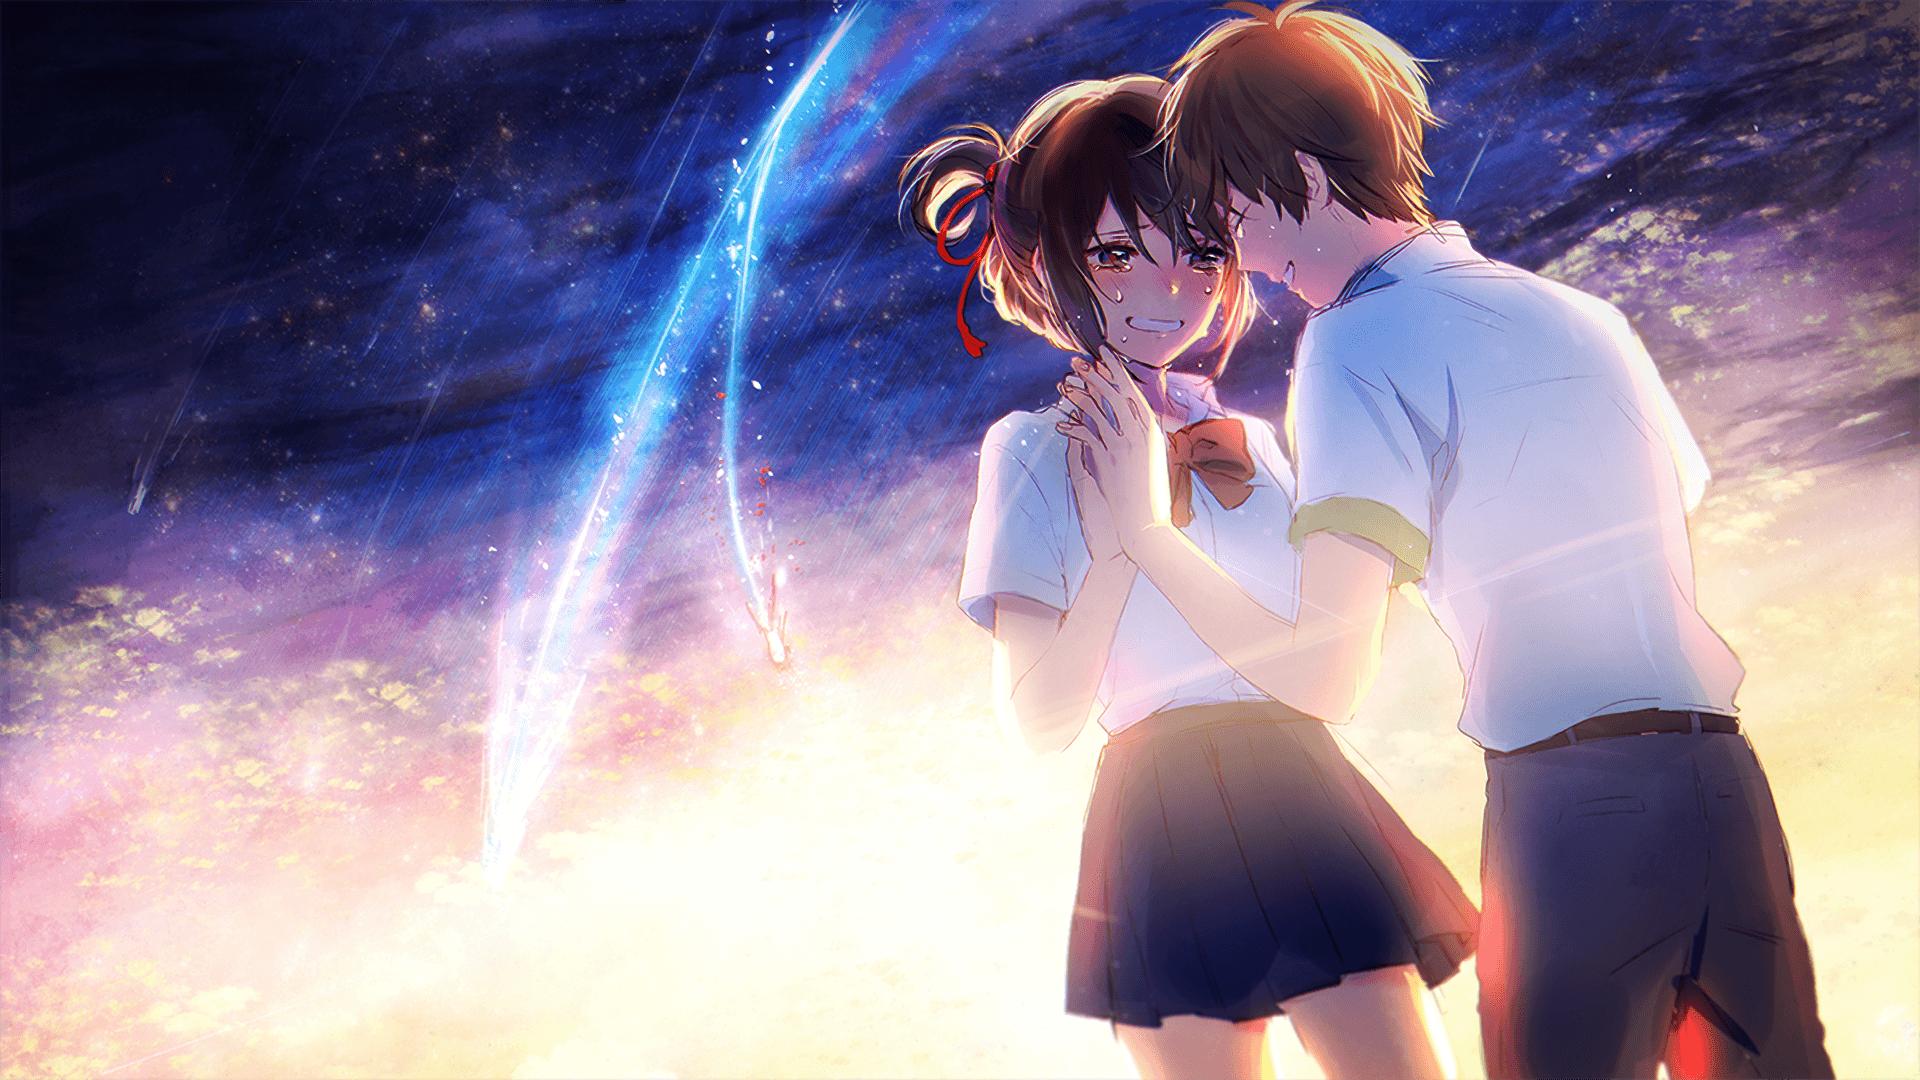 Your Name Anime 2016 Wallpapers Top Free Your Name Anime 2016